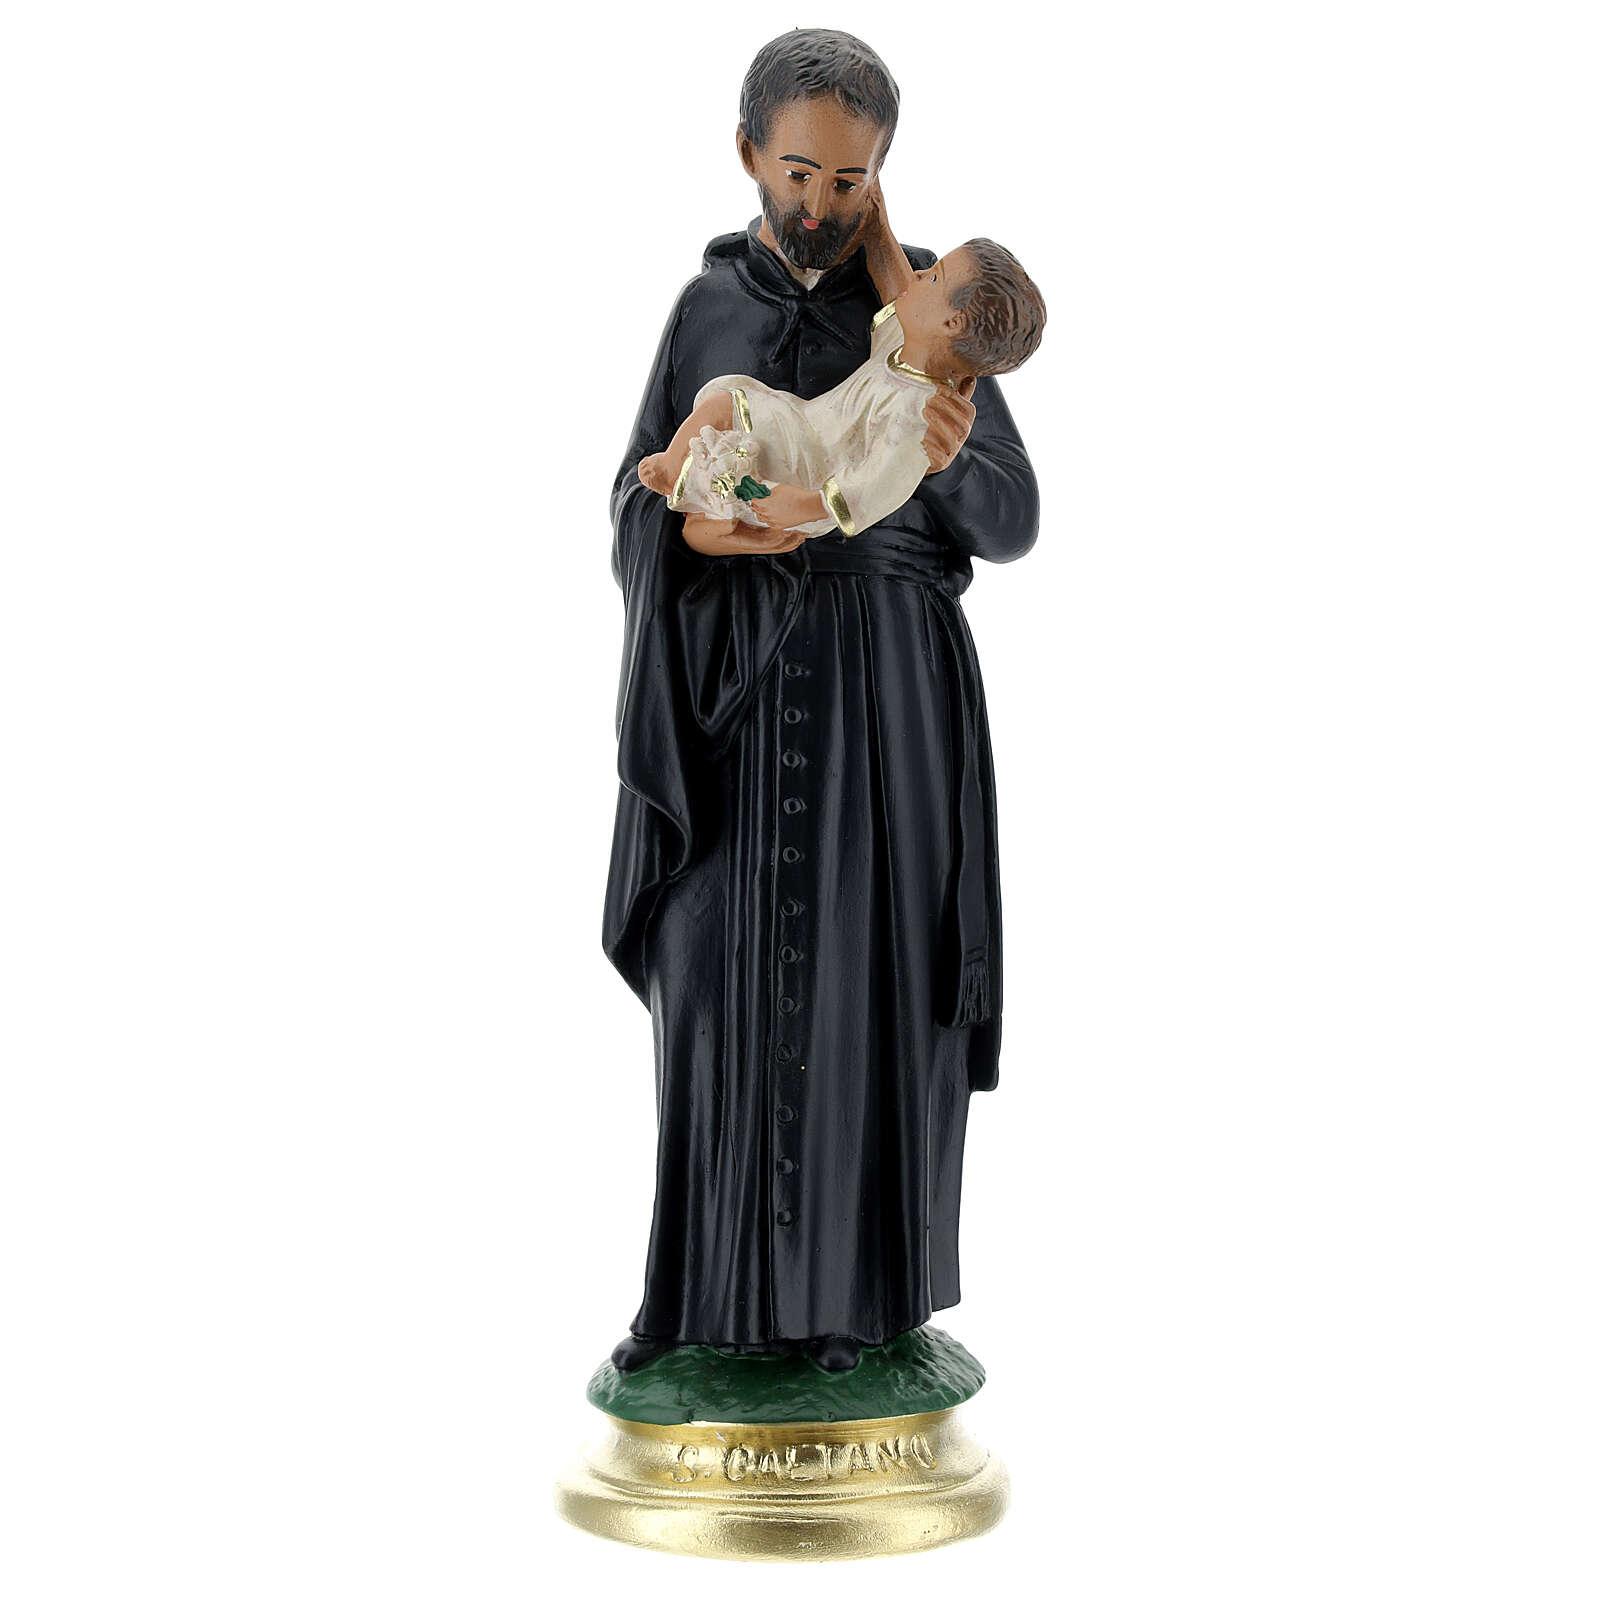 Saint Gaëtan statue 25 cm plâtre peint main Arte Barsanti 4